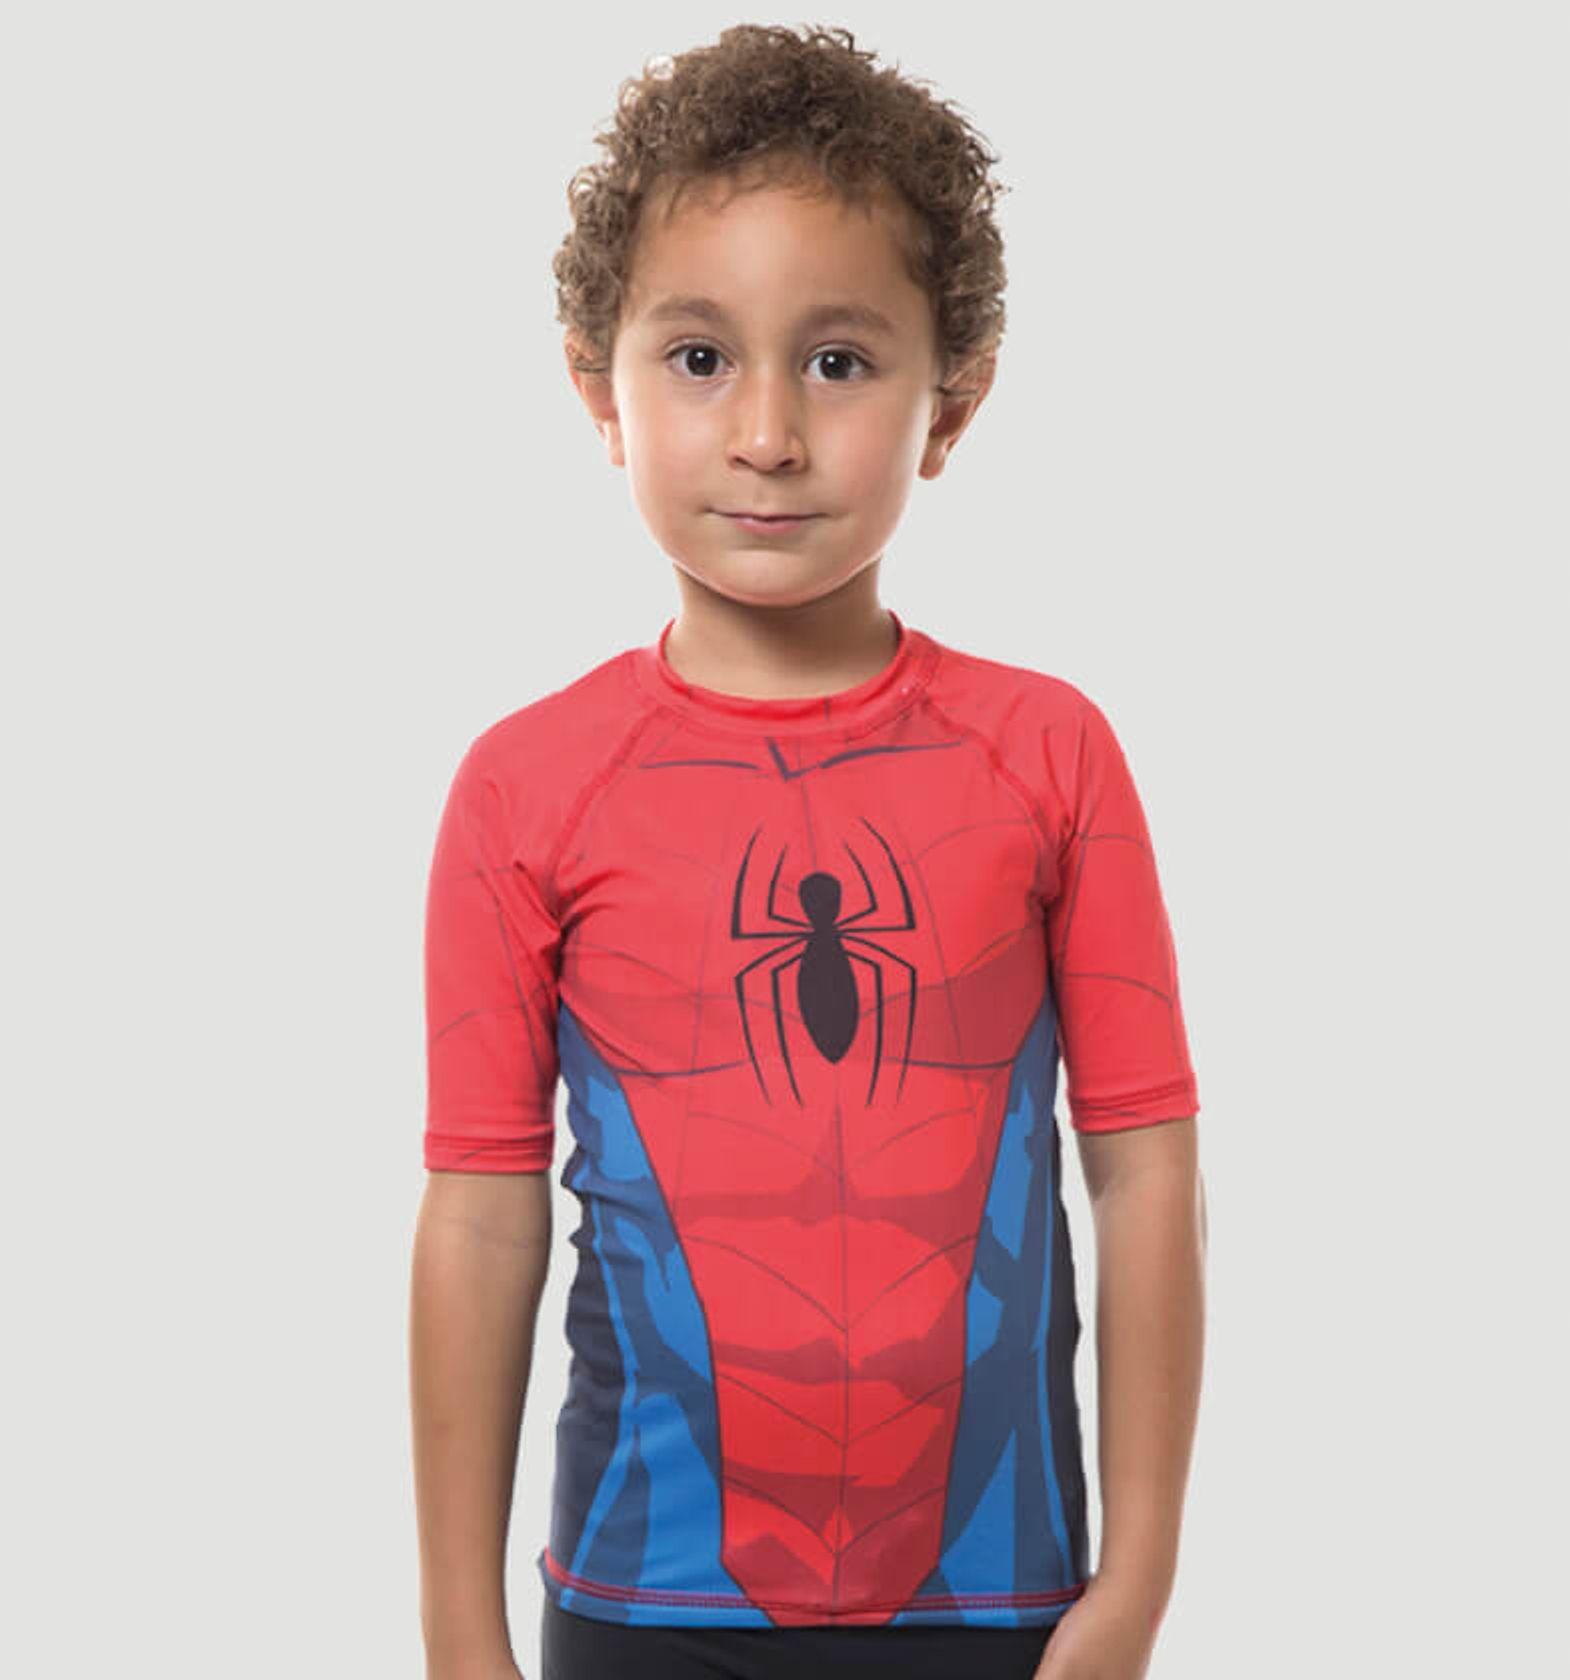 UV LINE Camiseta Acqua Homem Aranha MC Infantil Prot Solar